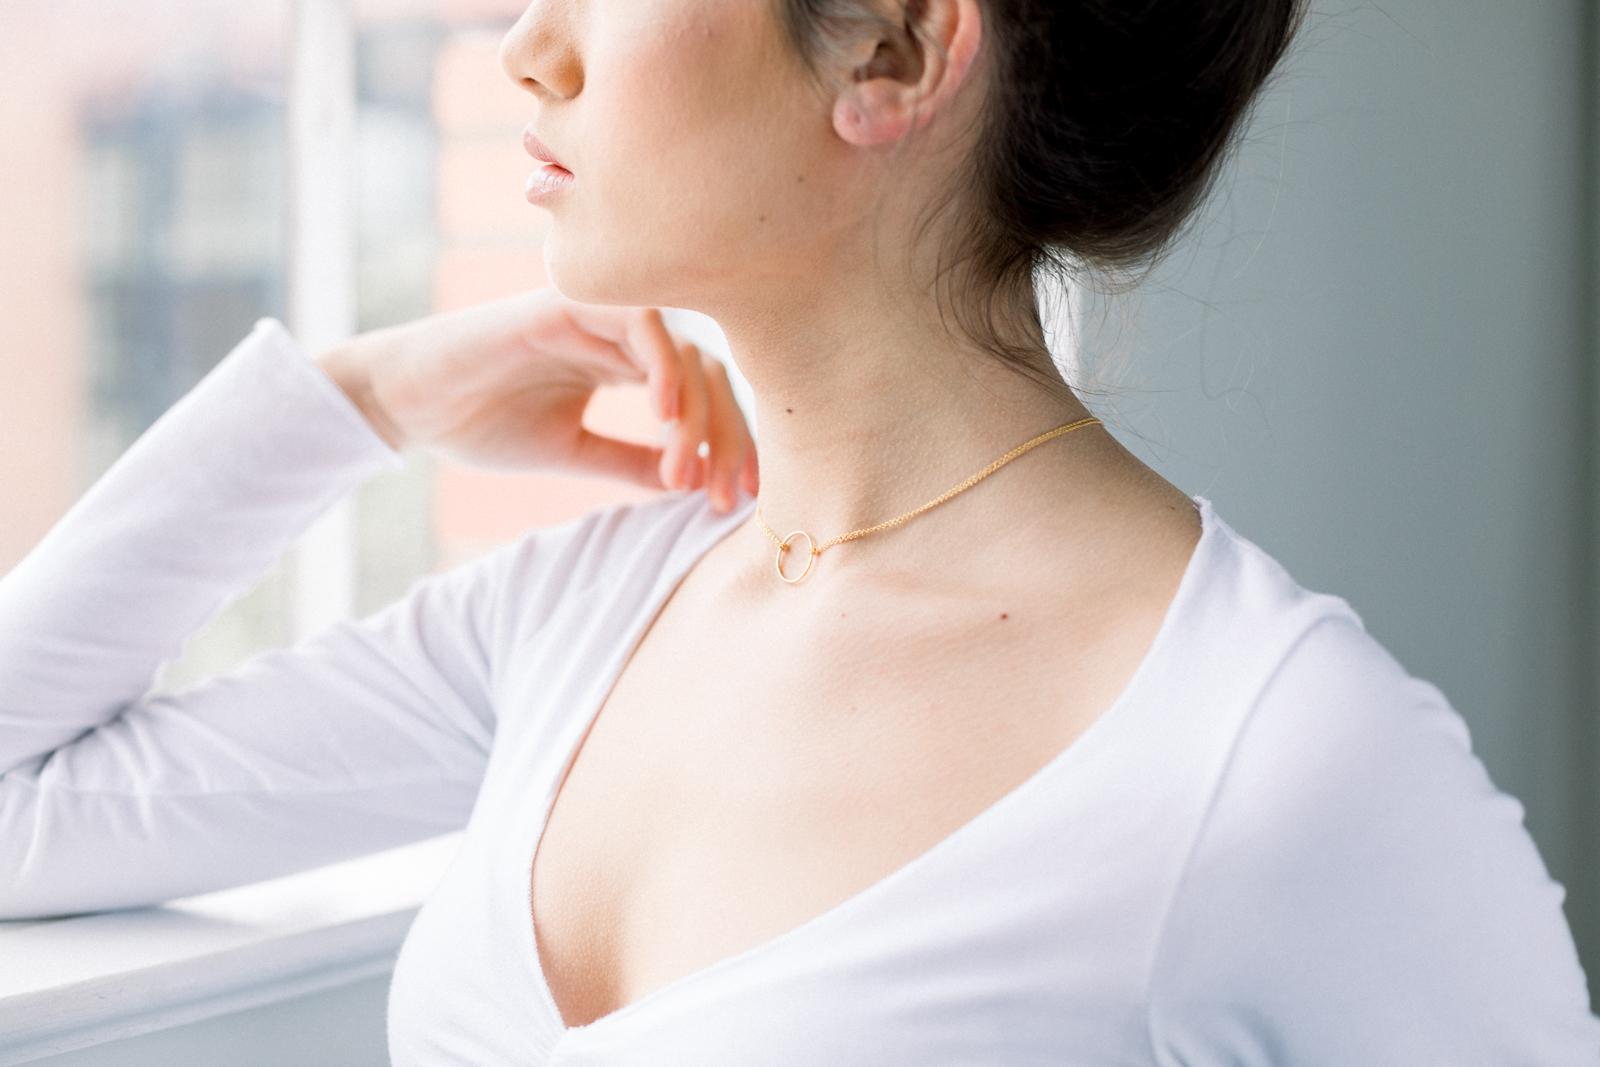 190217-0016-Rachelle-Celine-Handmade-Jewelry-DC-Elisenda-Llinares